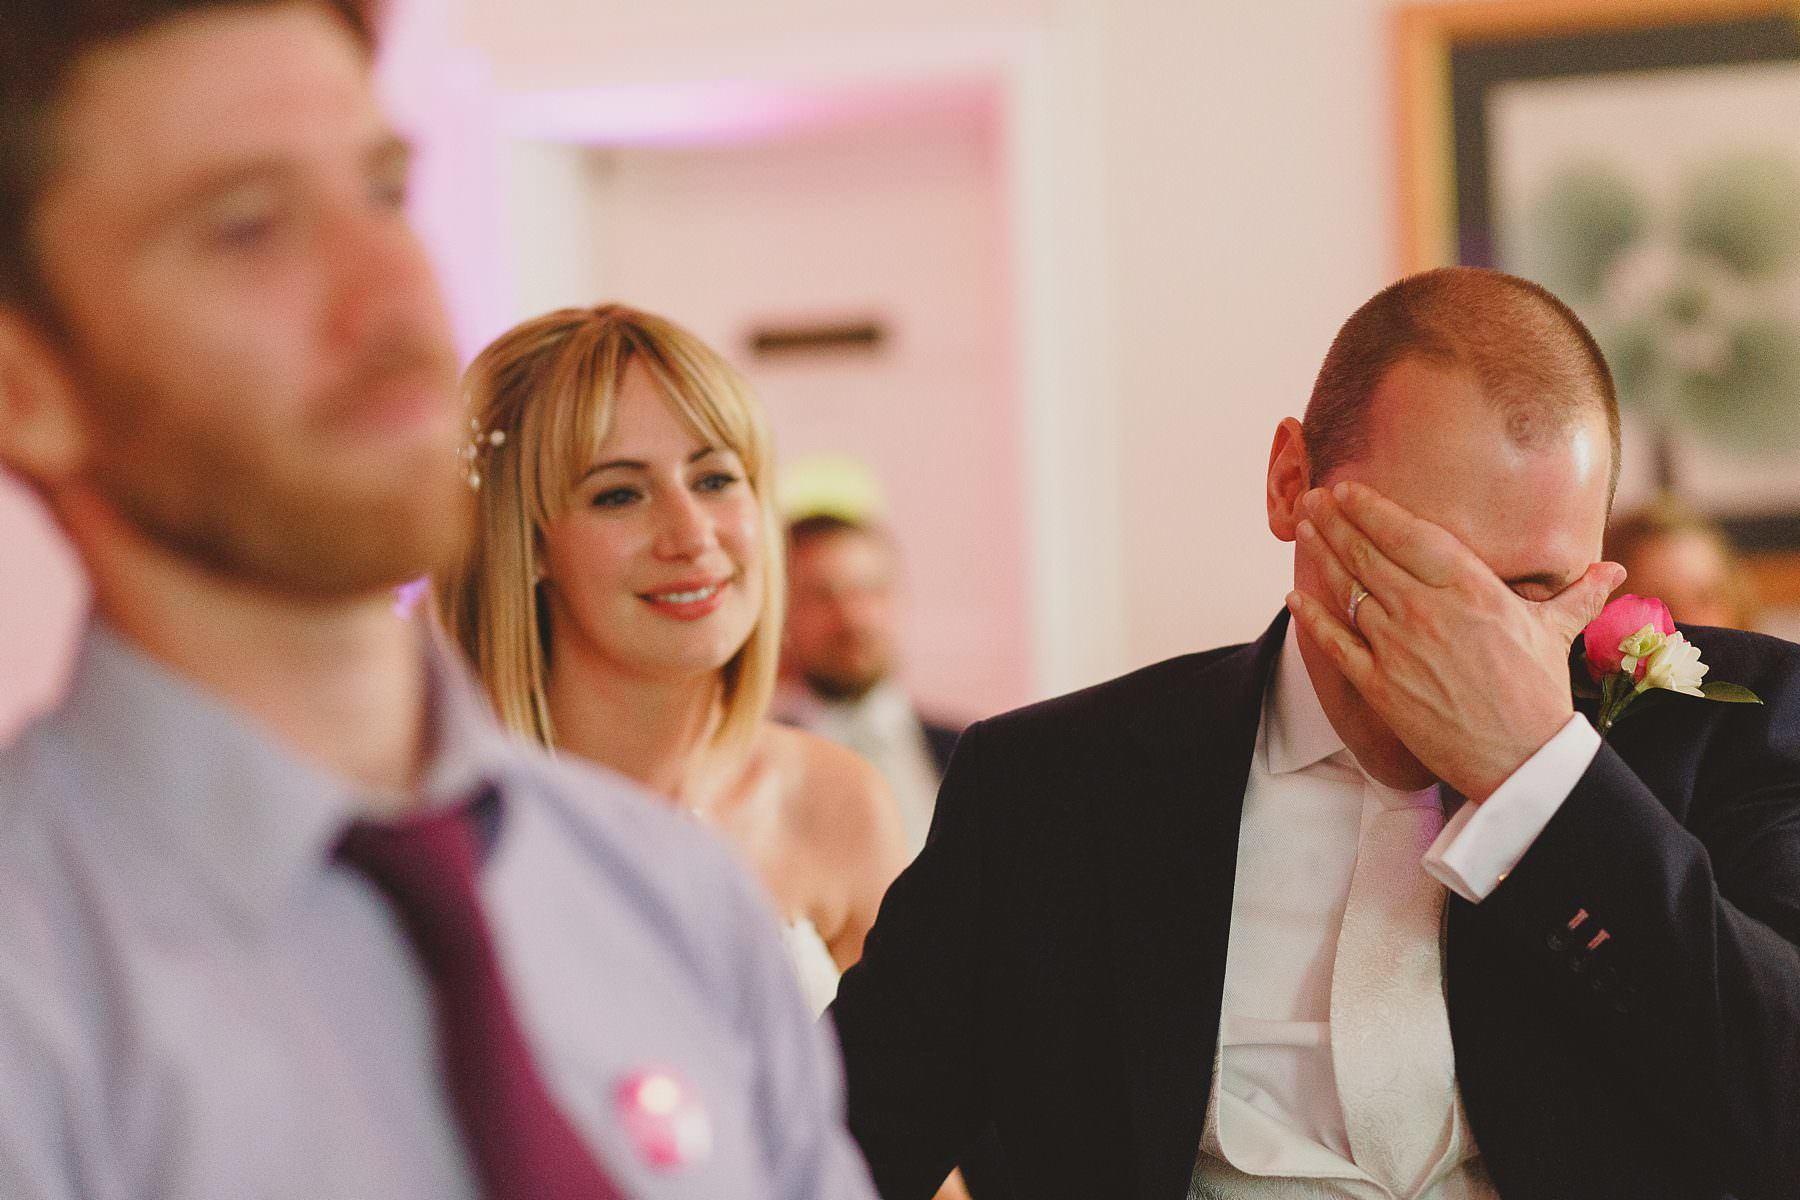 weddings-at-bristol-zoo-037